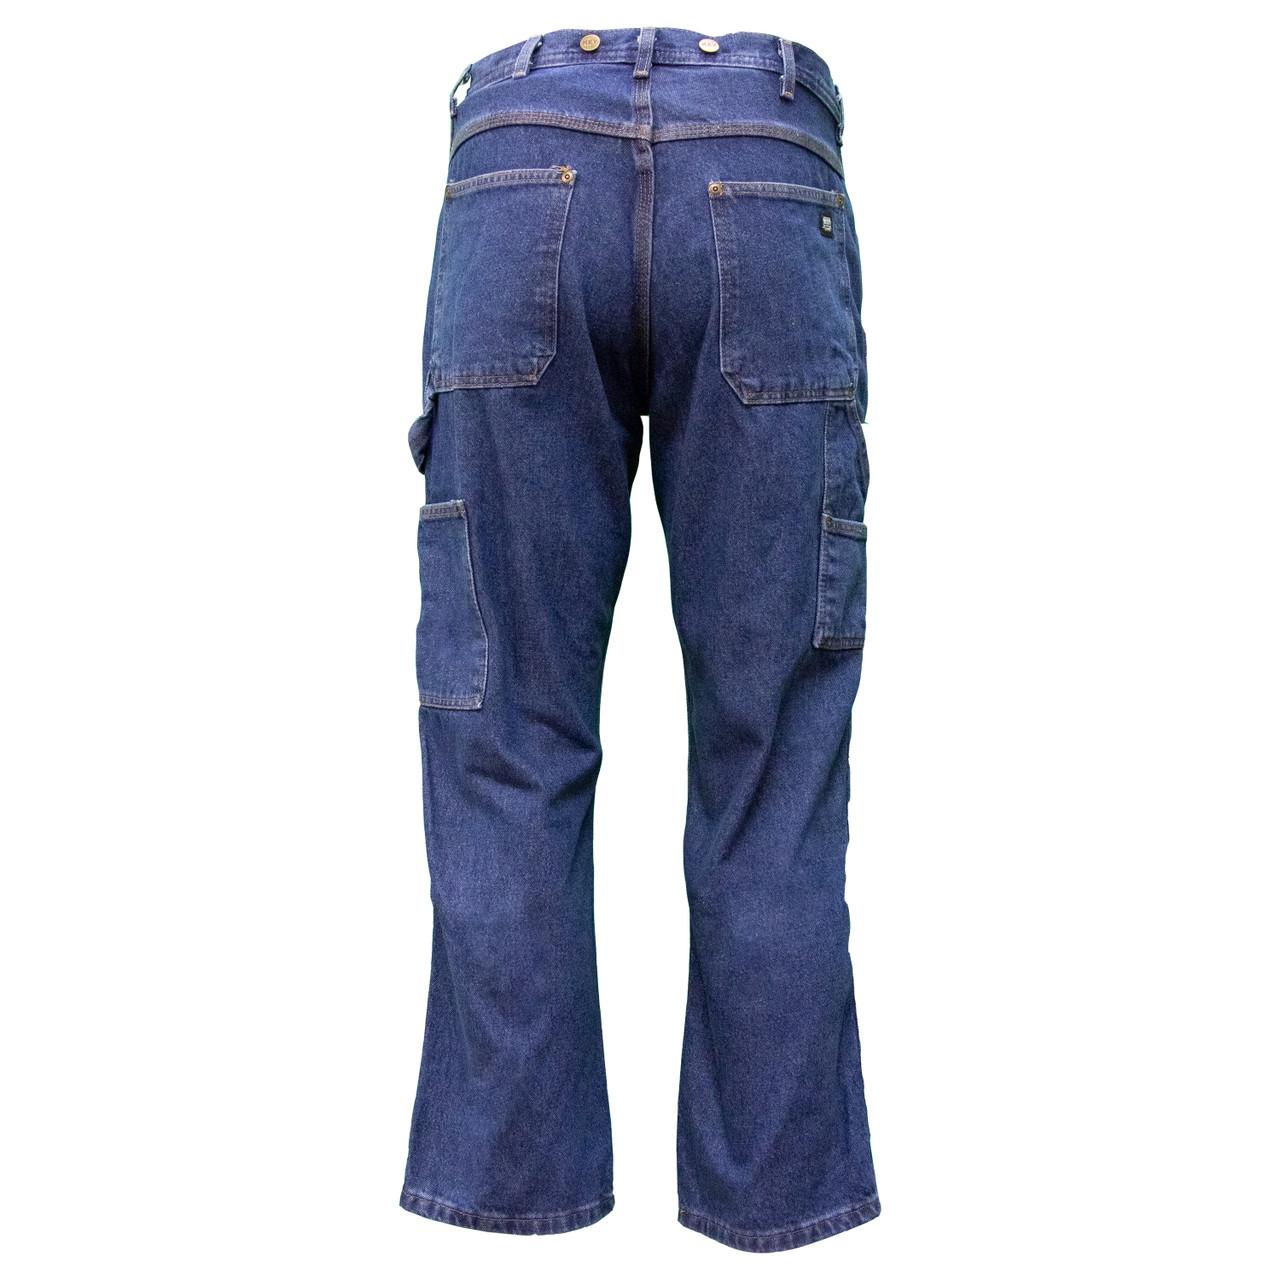 Key Apparel Premium Denim Enzyme Washed Denim Shorts